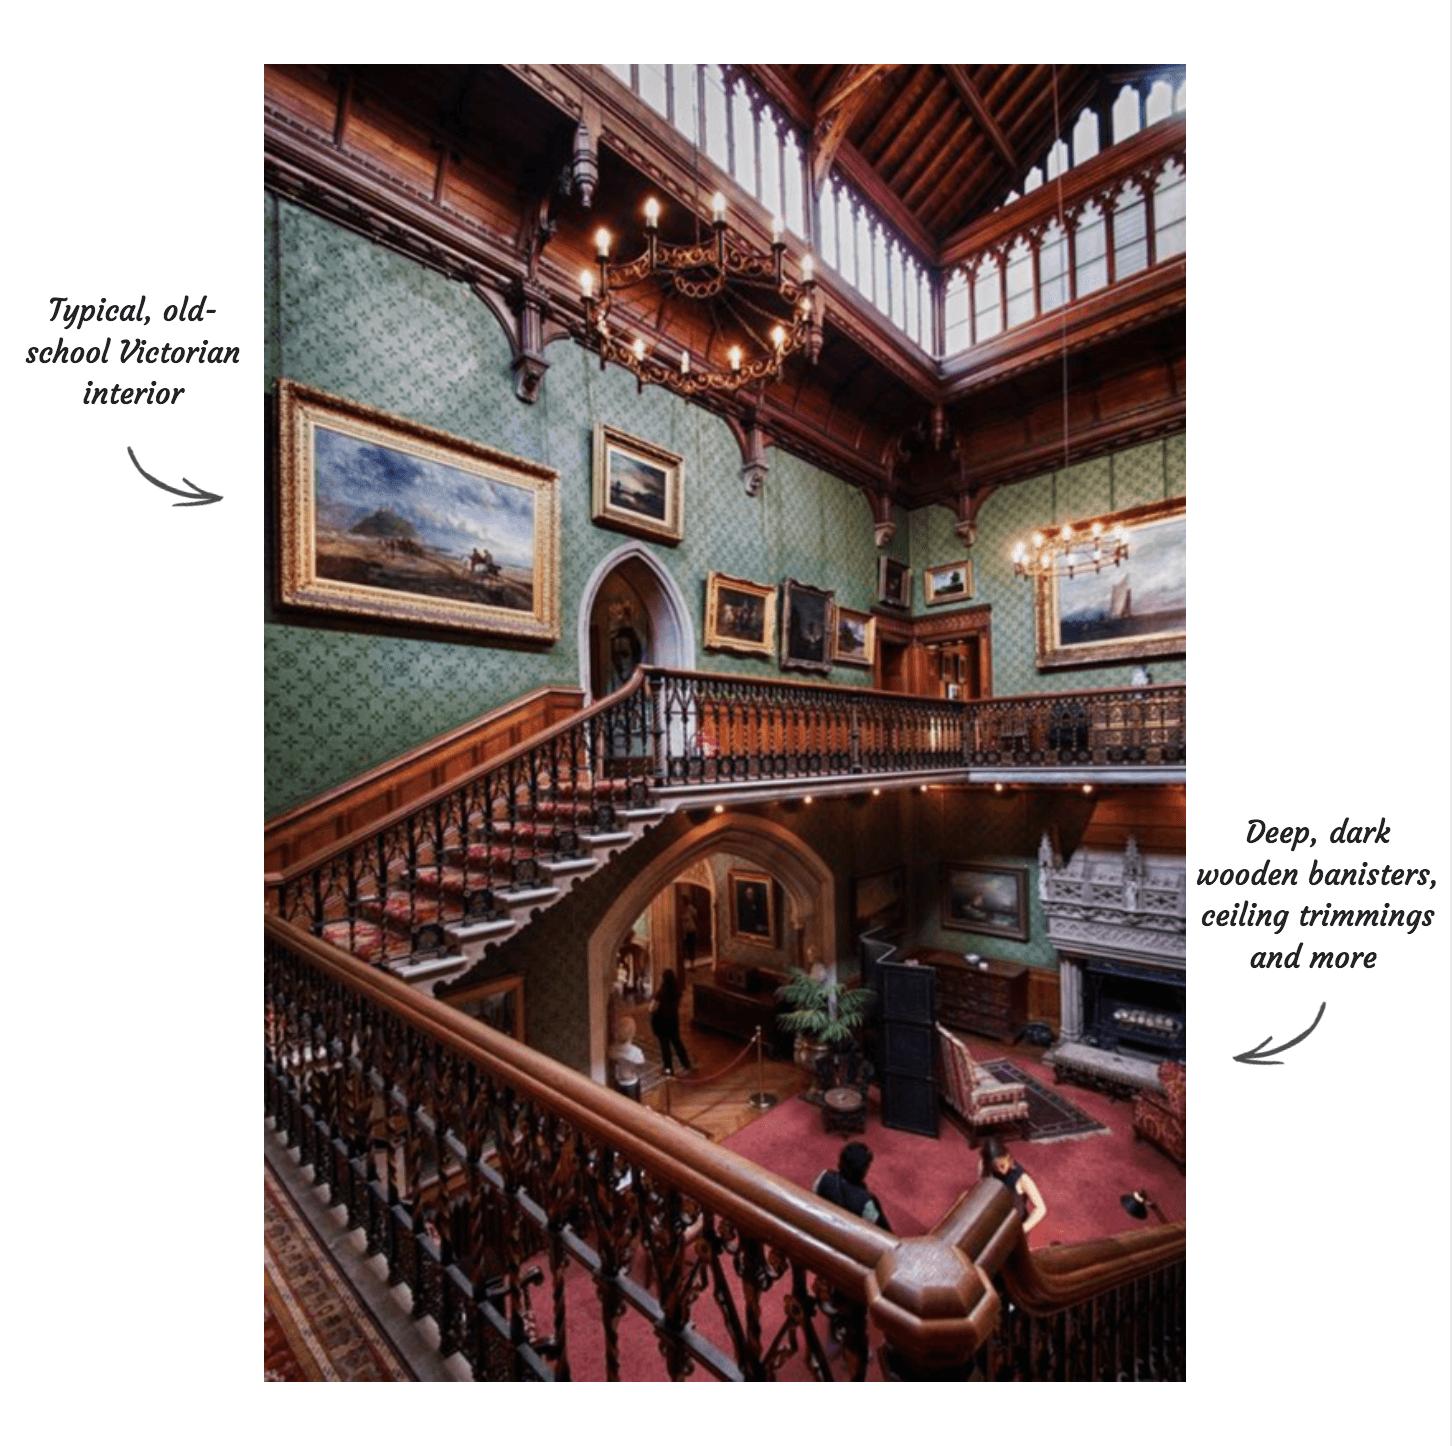 Typical Victorian Interior